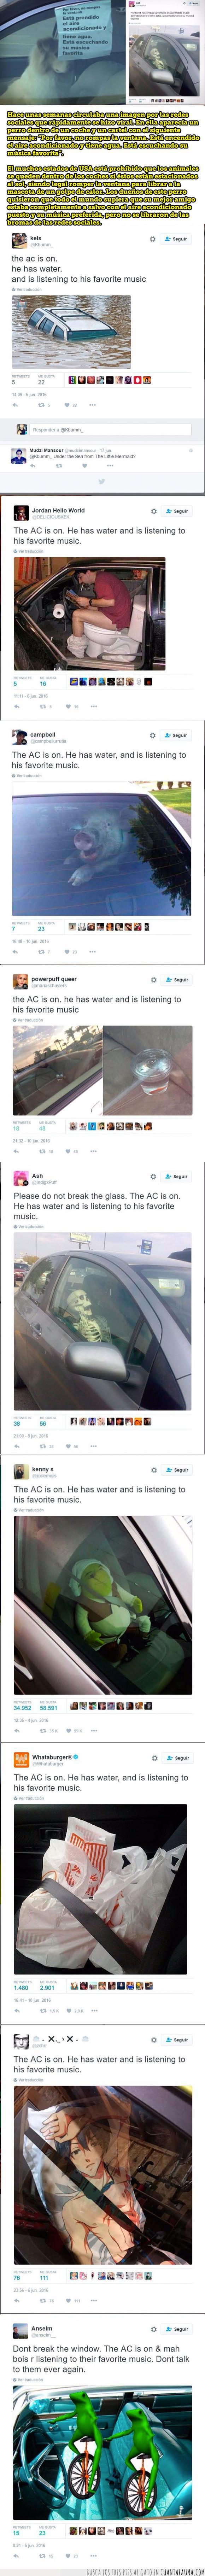 coche,dentro,perros